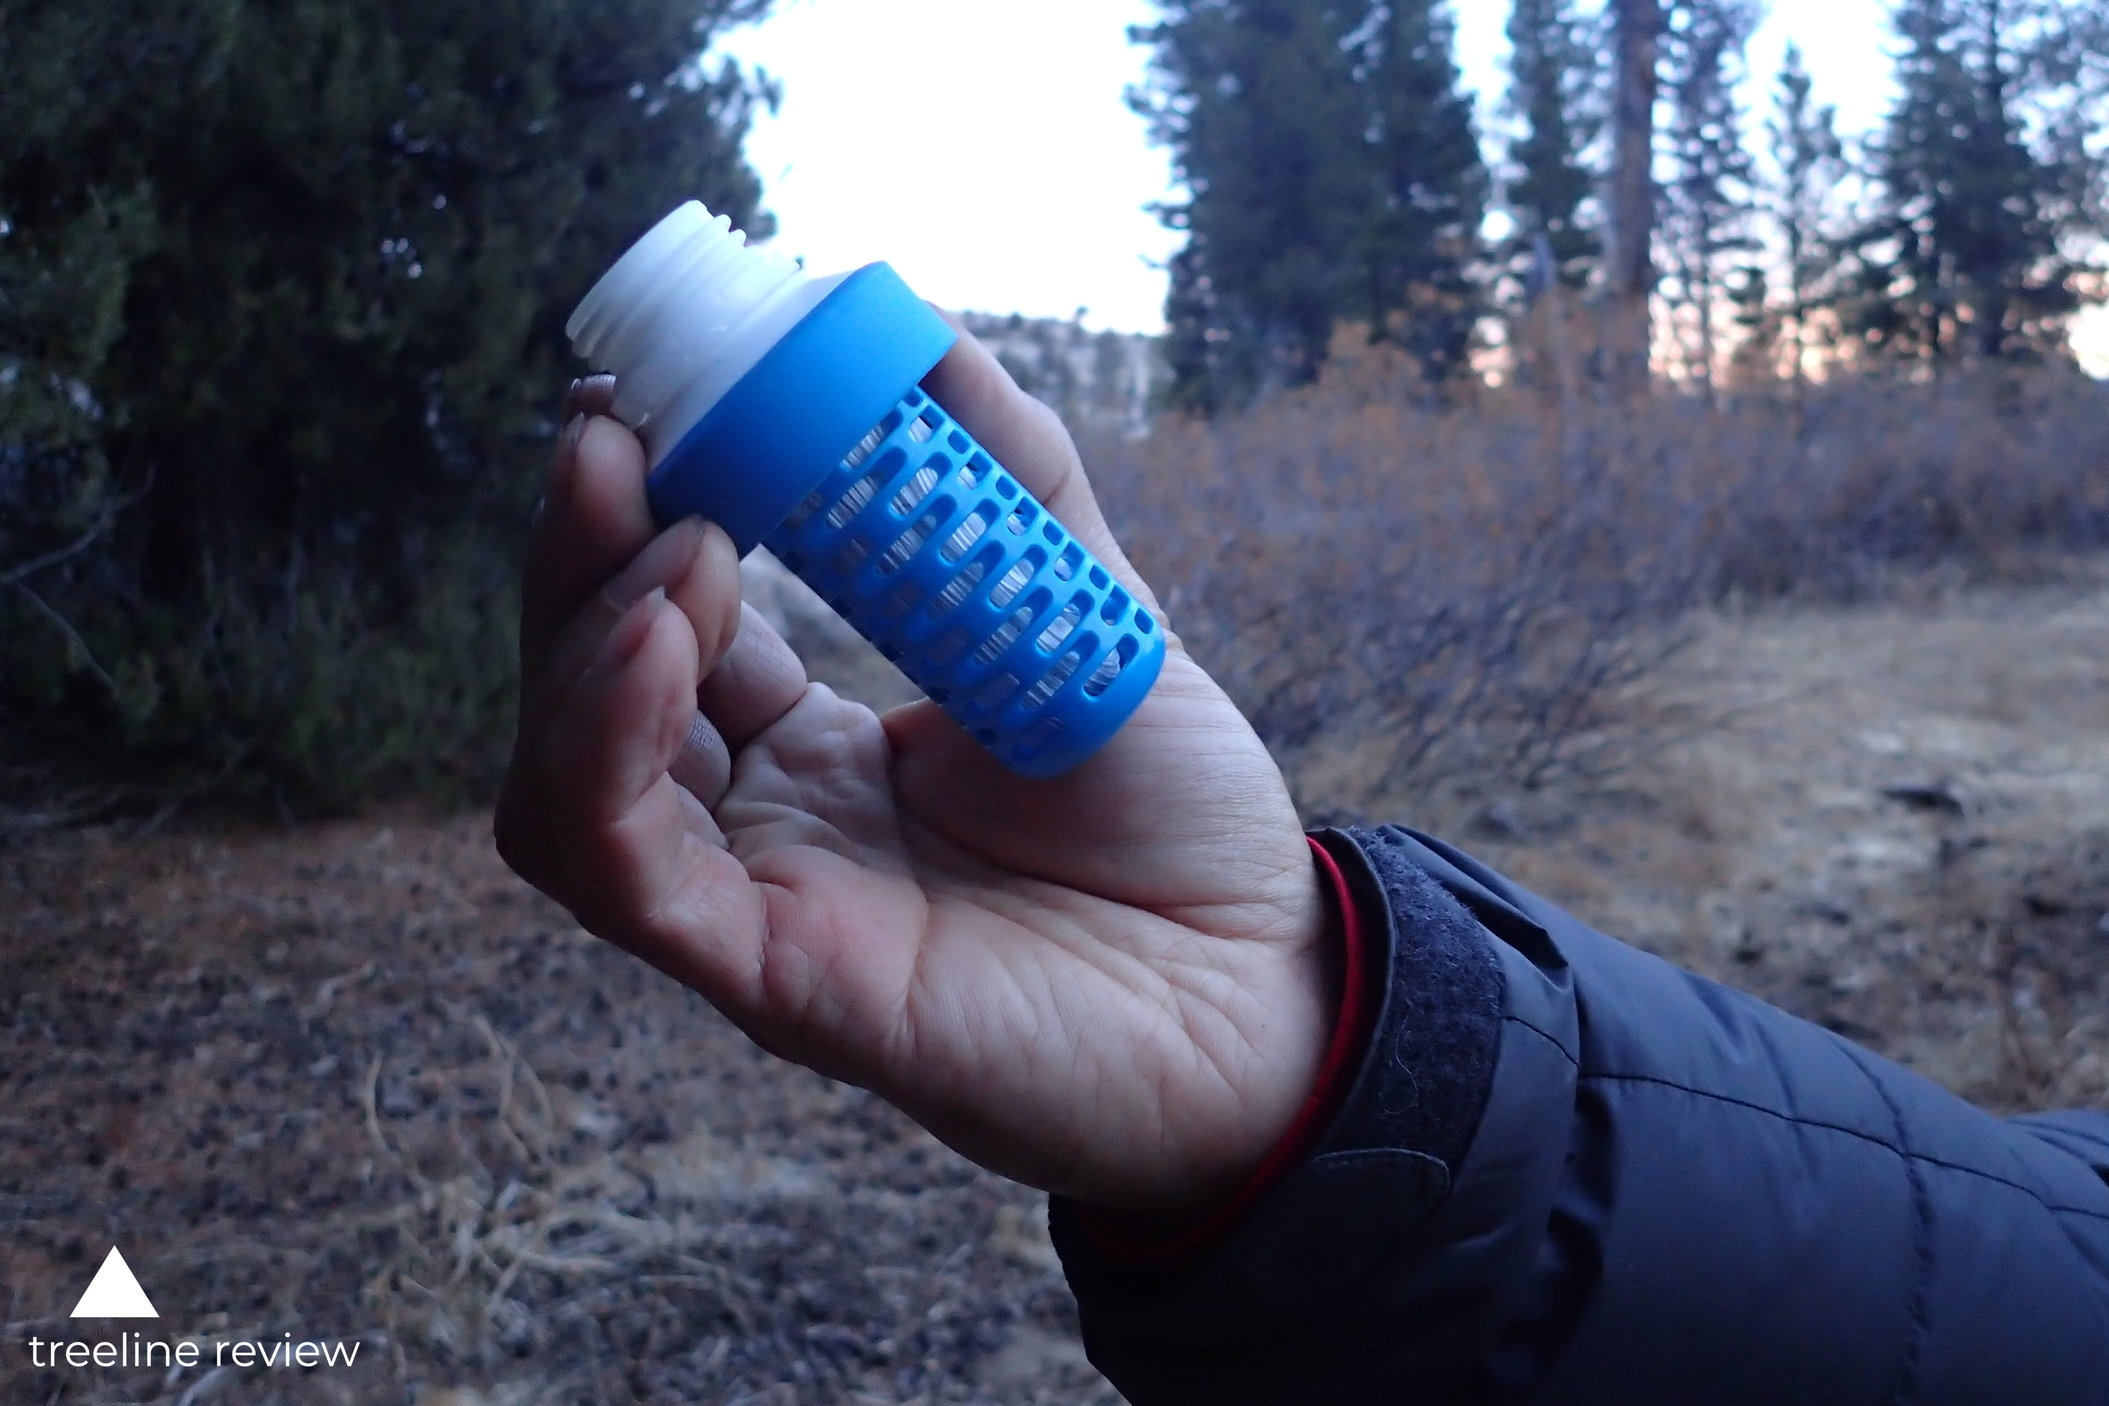 BEST WATER FILTER FOR SHORT TRIPS - Katadyn BeFreeRead why→